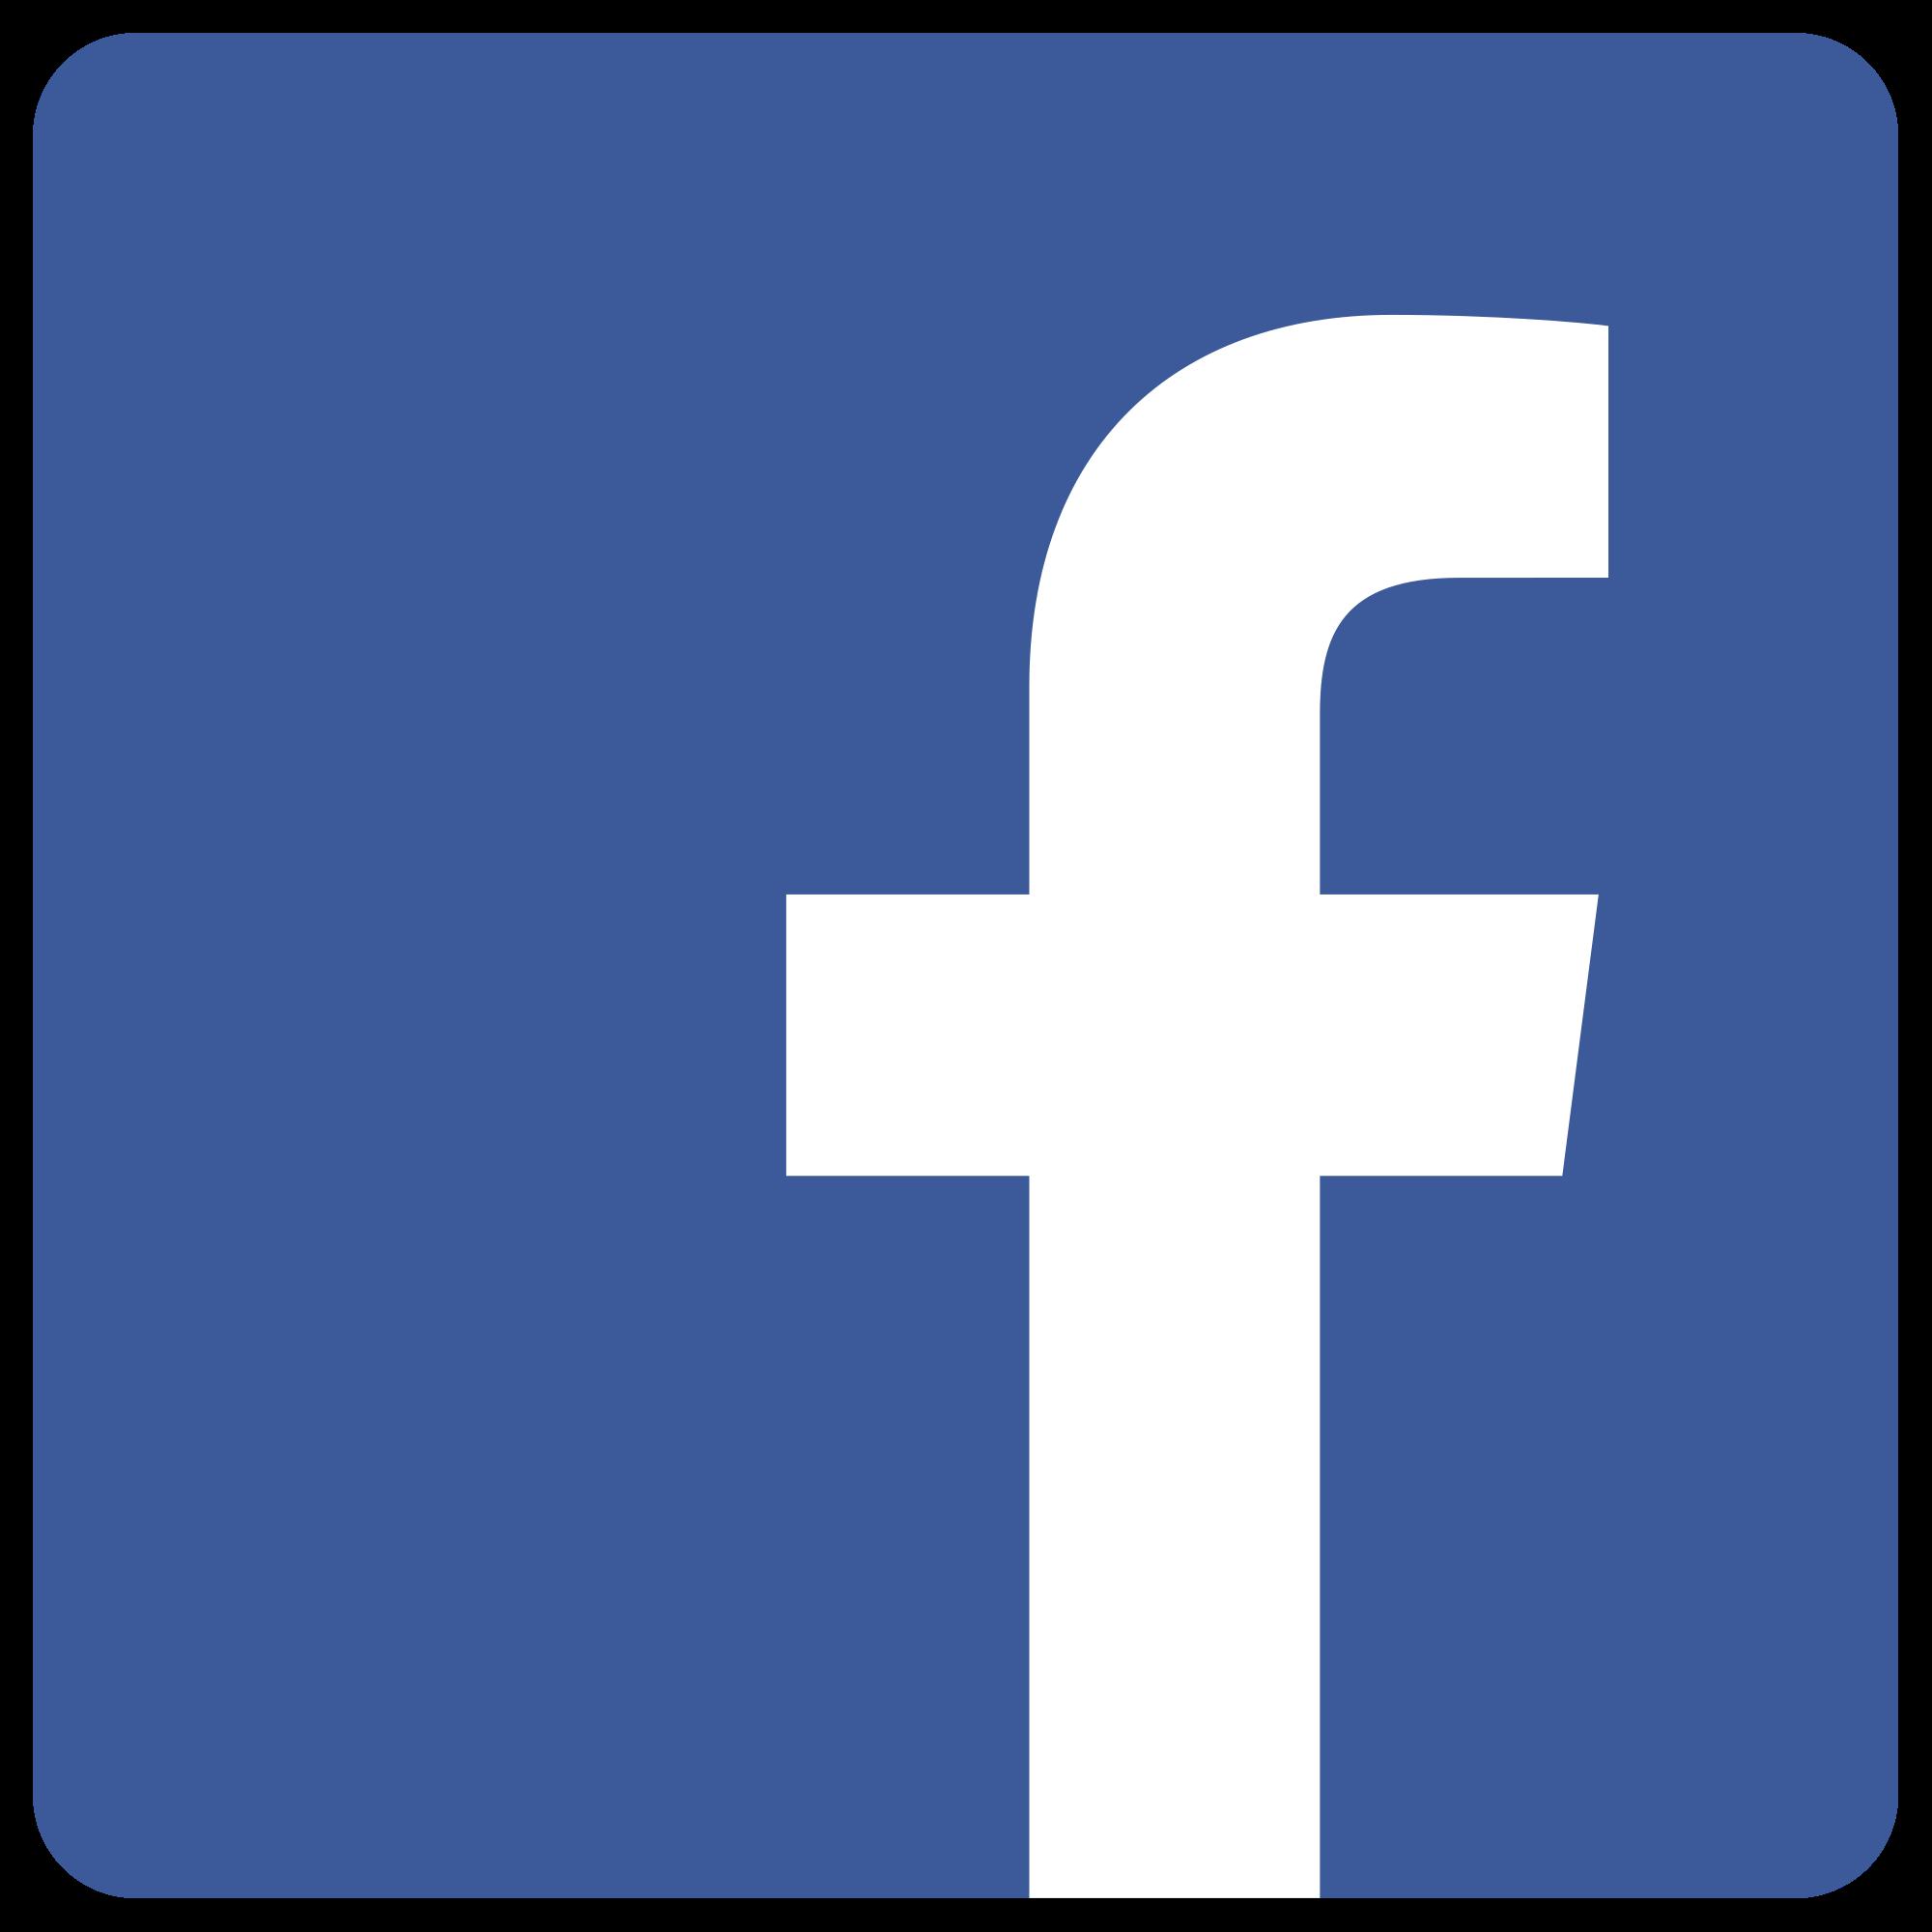 Facebook - Mark Zuckerberg - modification fil d'actualité